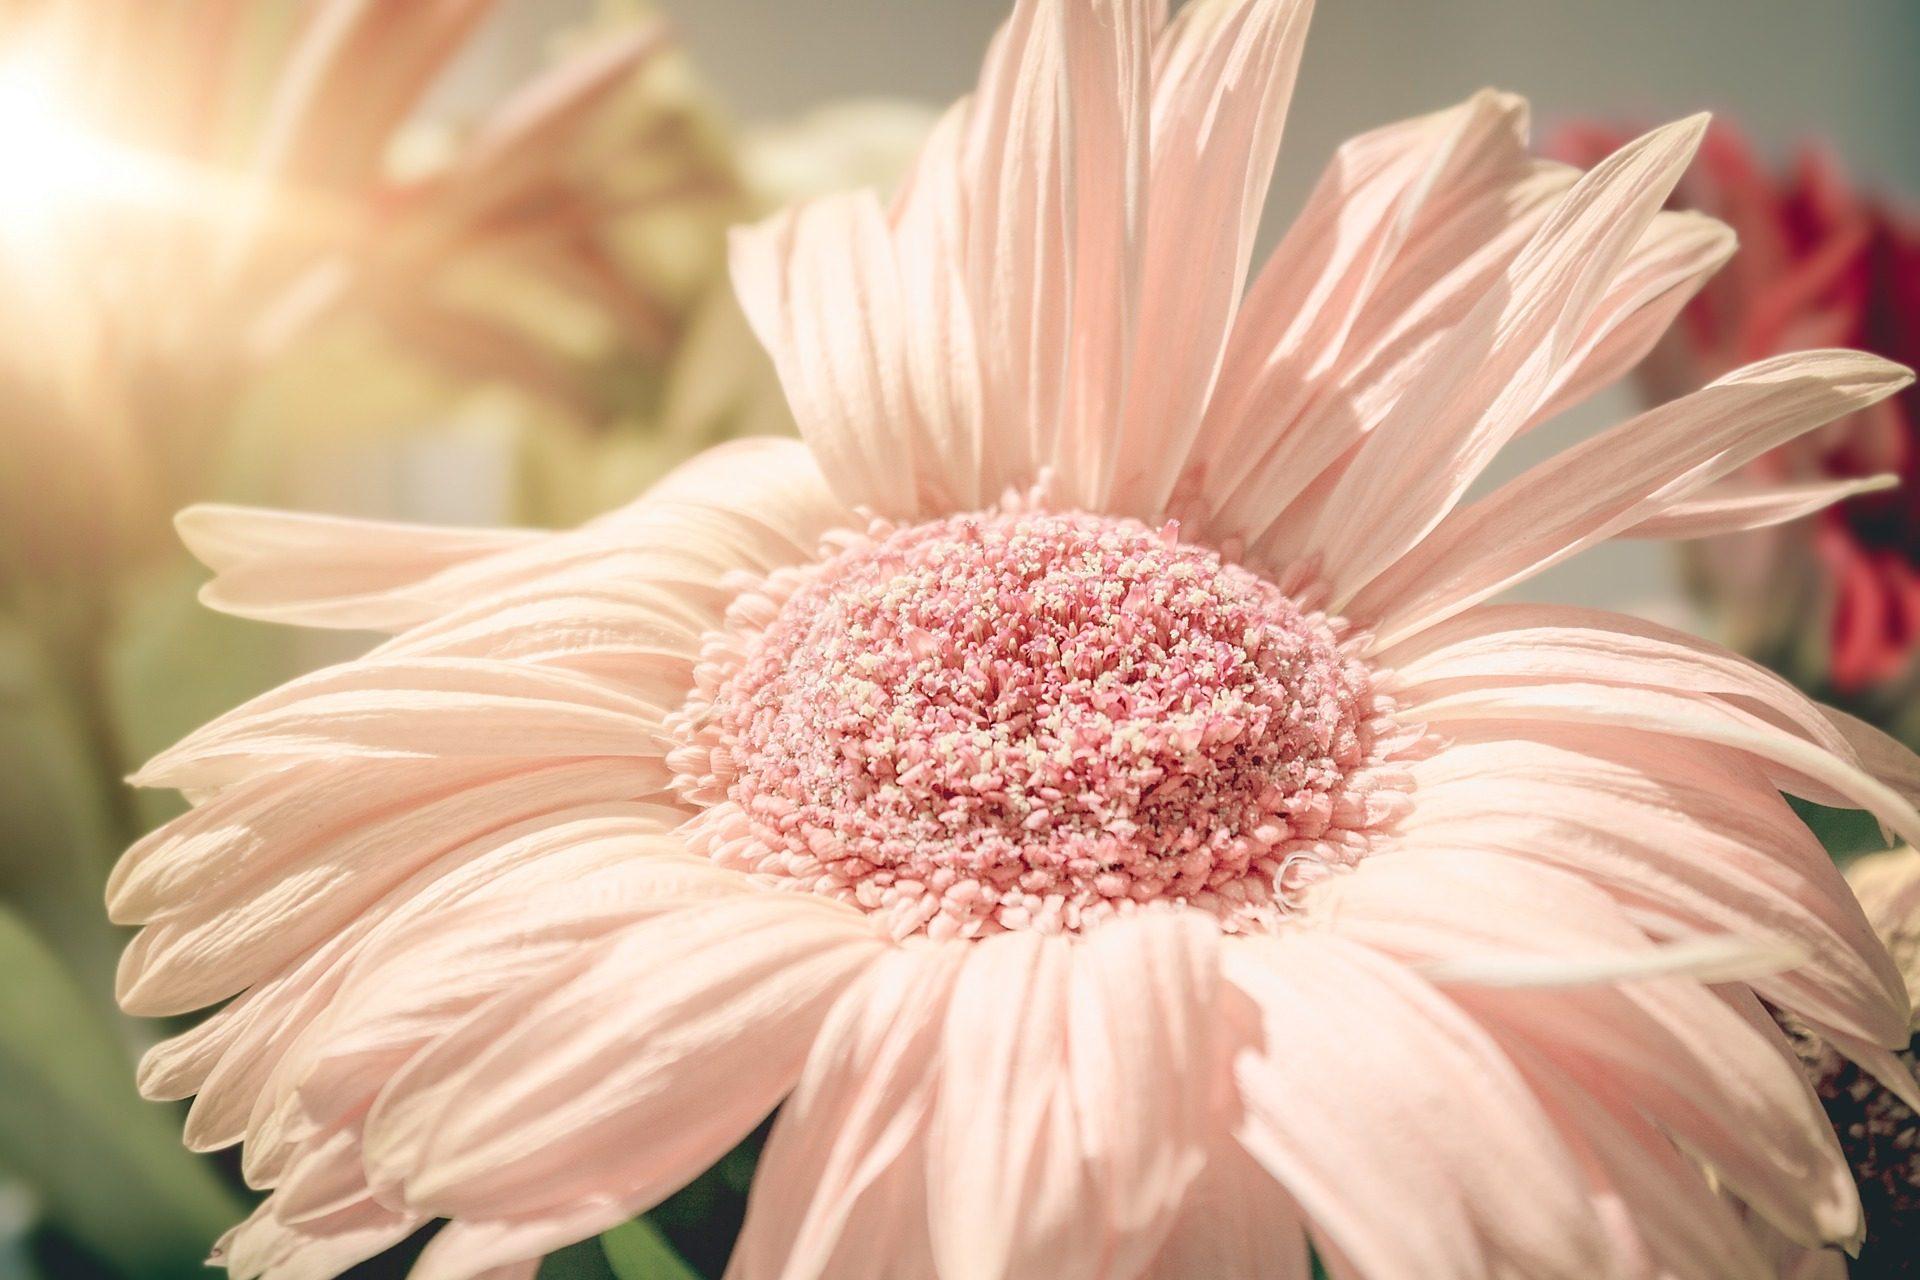 flor, rosa, pétalos, halos, de cerca - Fondos de Pantalla HD - professor-falken.com